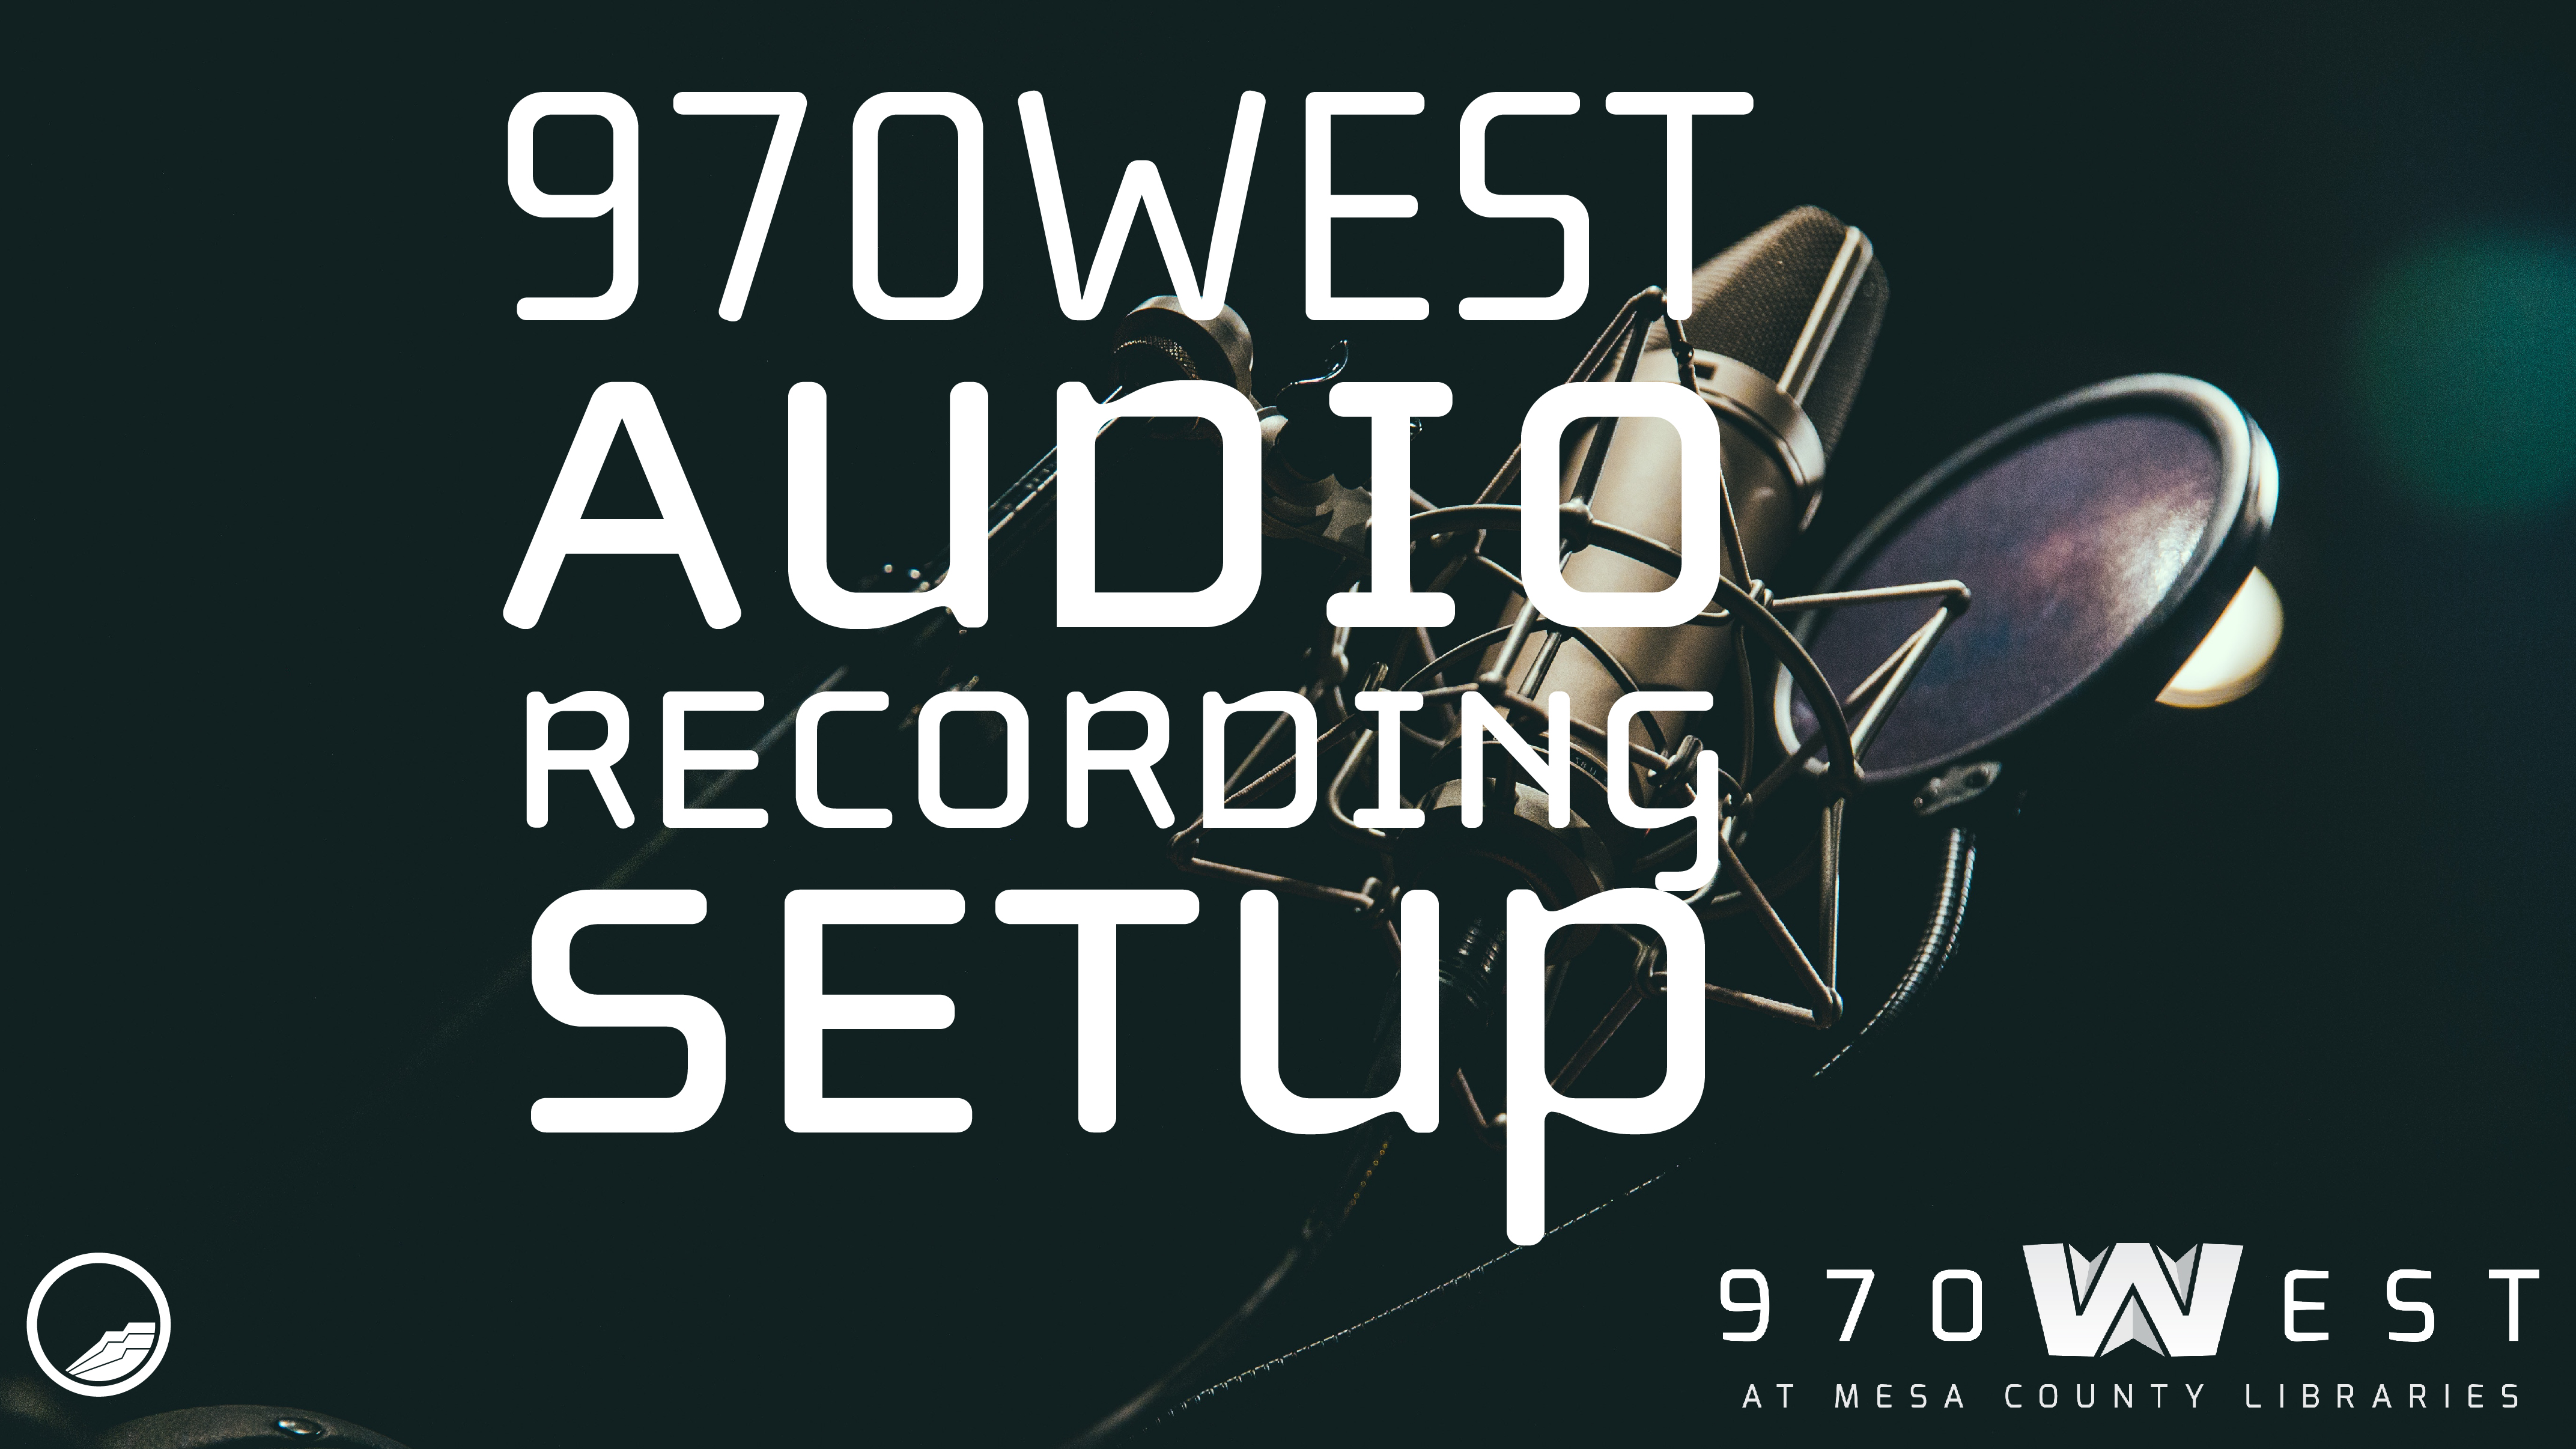 970West Audio Recording Setup (Audio class 2 of 4)